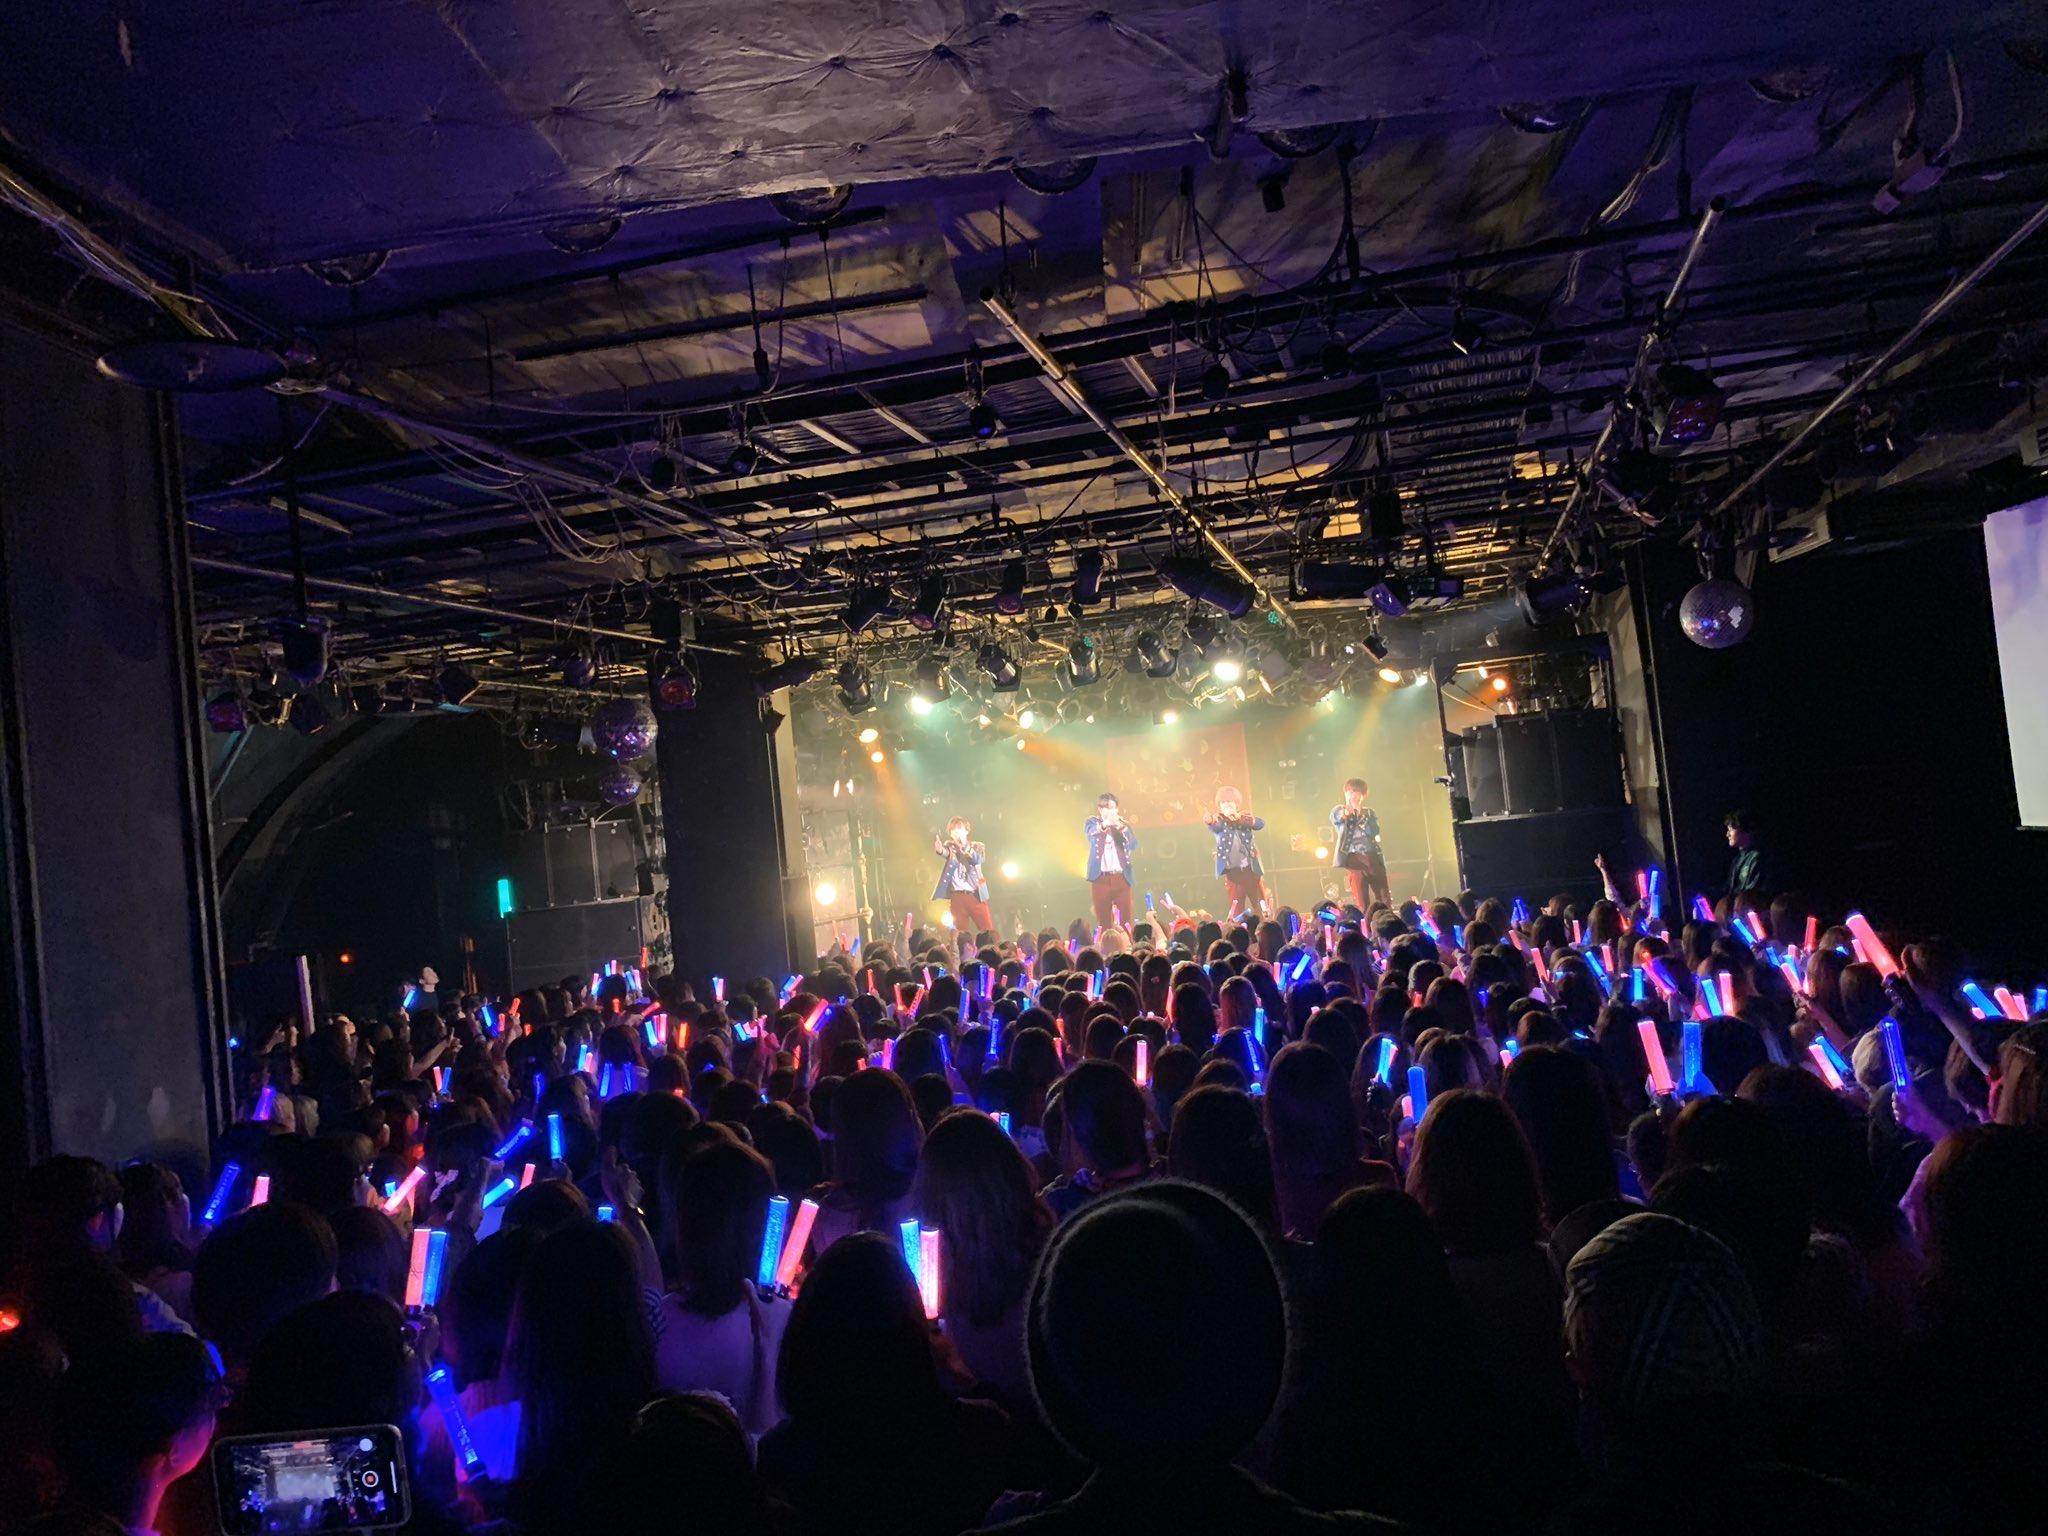 【NEWS】5月30日(土)東京カルチャーカルチャーにて『CUBERS 国際フォーラムC LIVE 2020 アフターイベント』開催決定!!